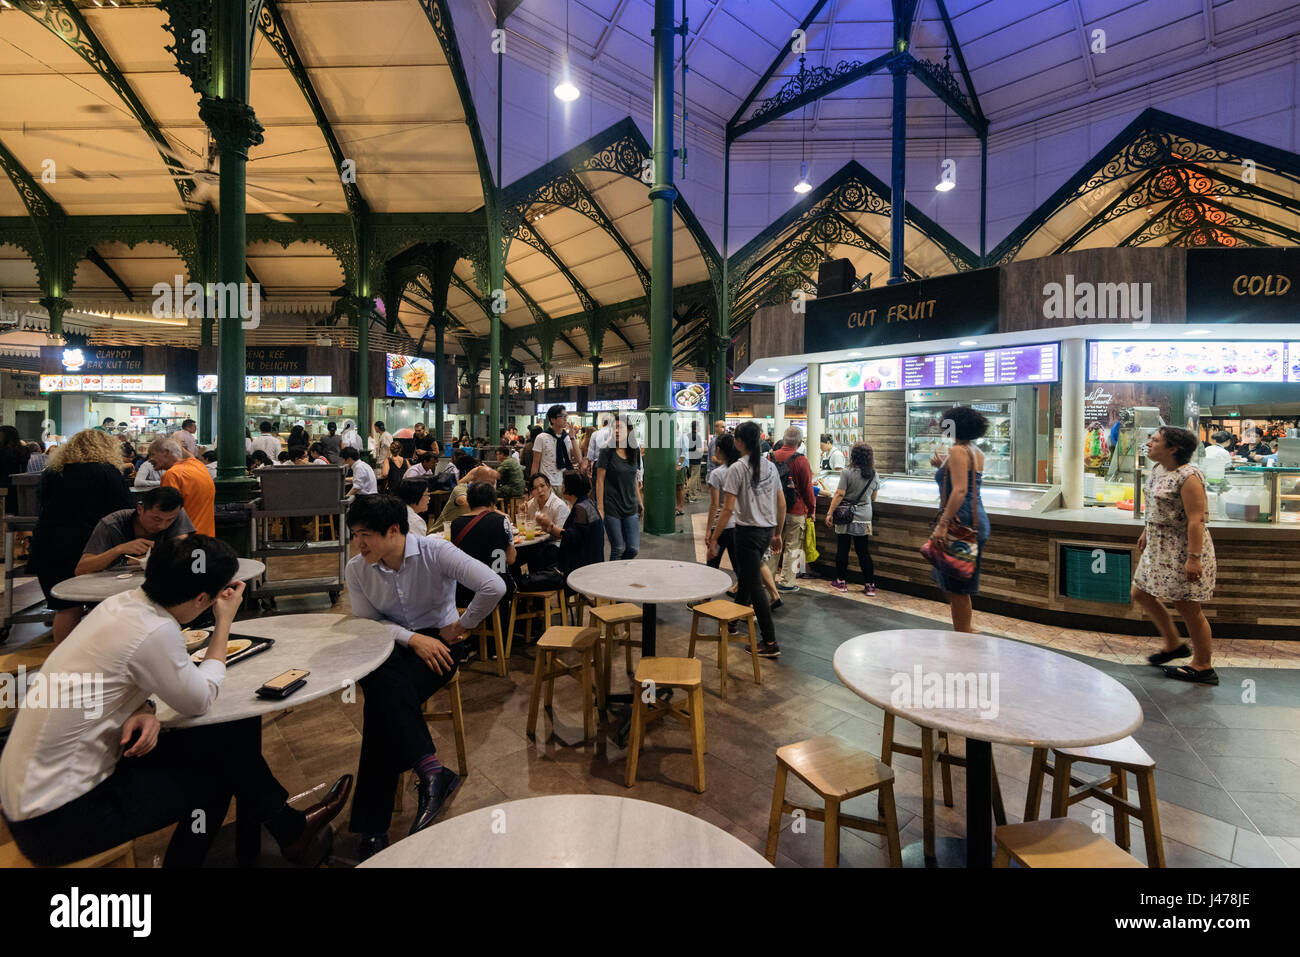 Singapore - Singapore - April 17, 2017: Inside the Telok Ayer Market in Singapore - Stock Image